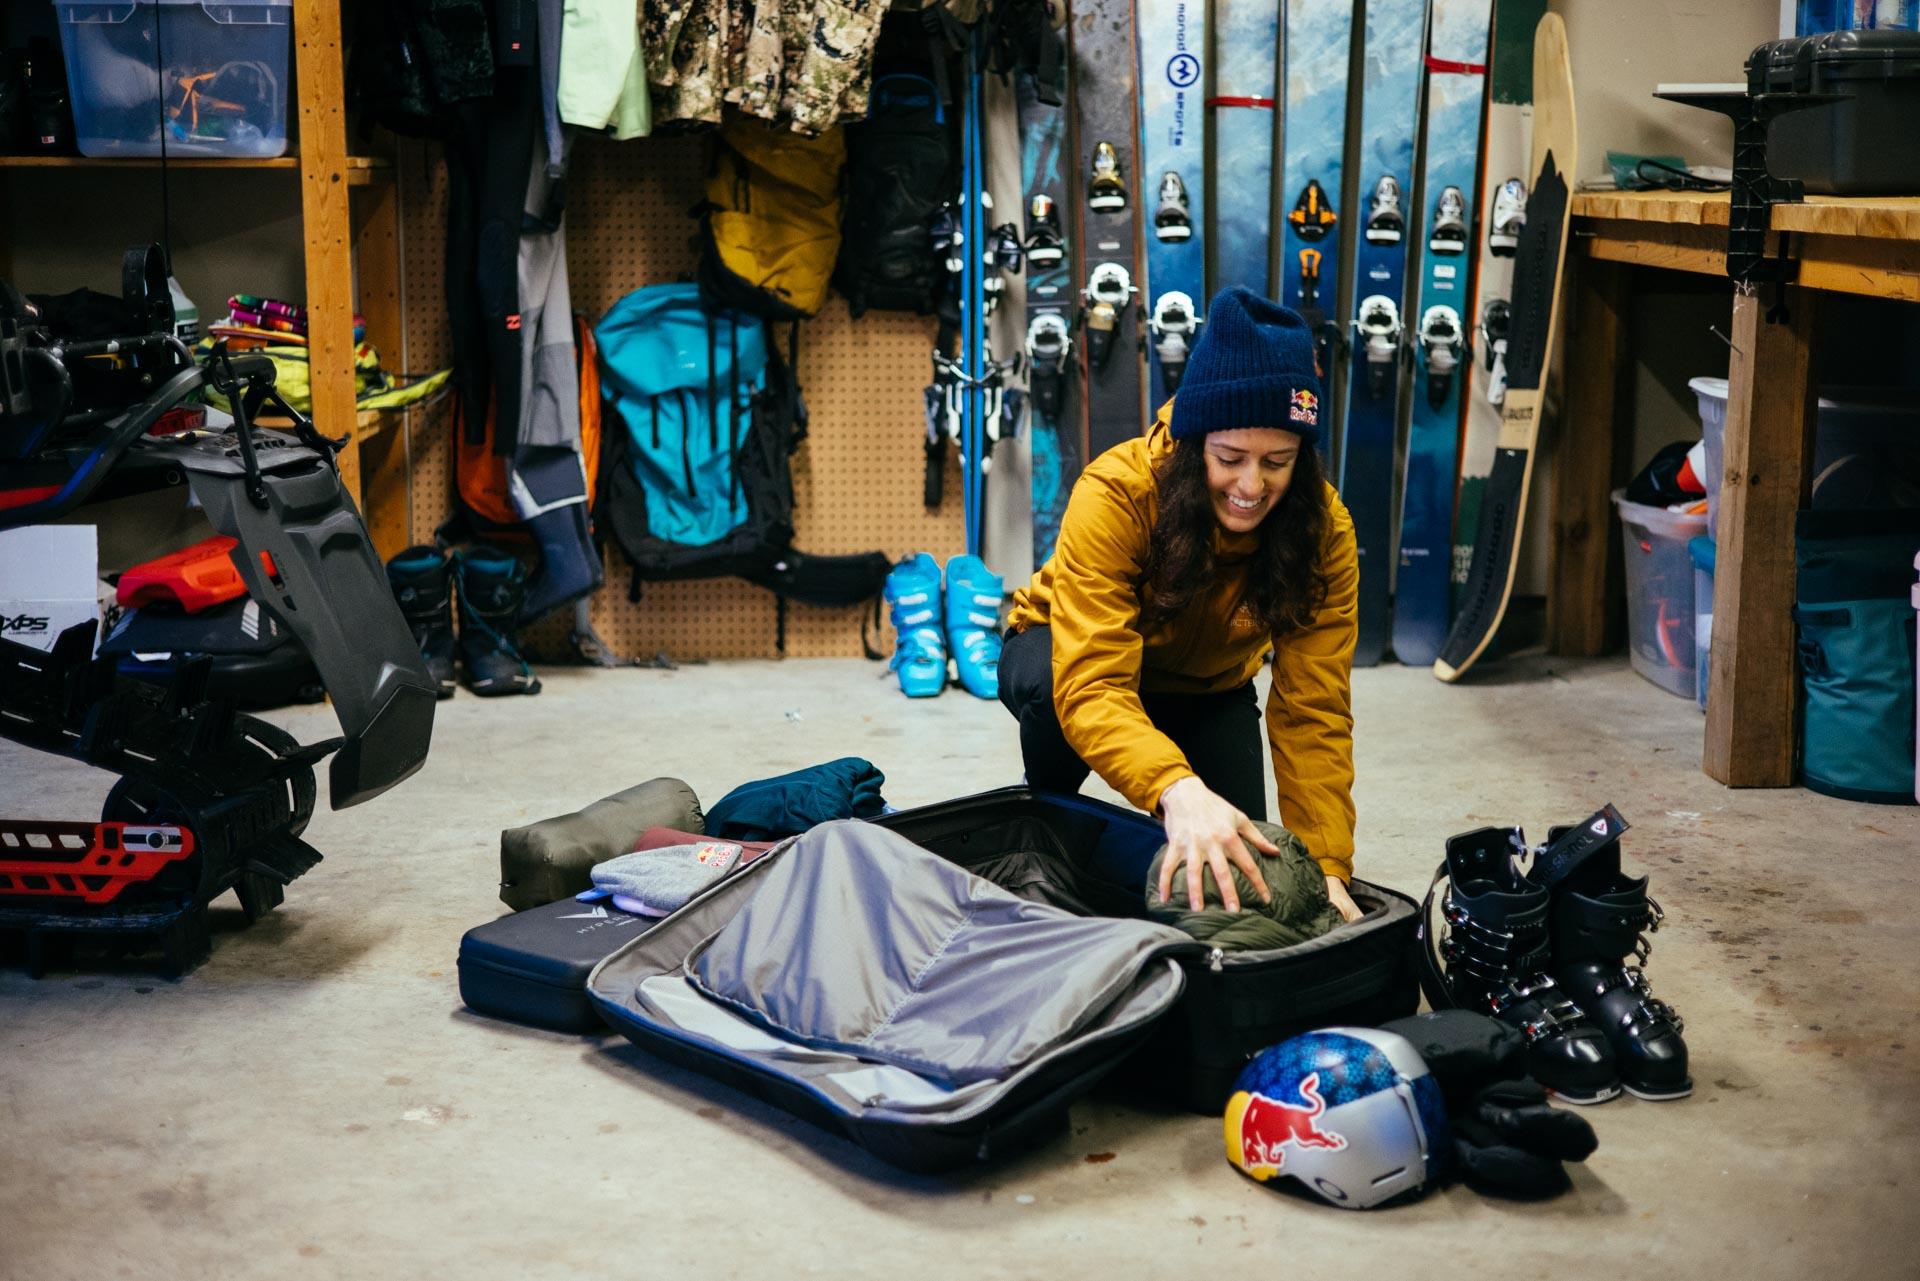 tatum monod packs ski gear for backcountry adventure